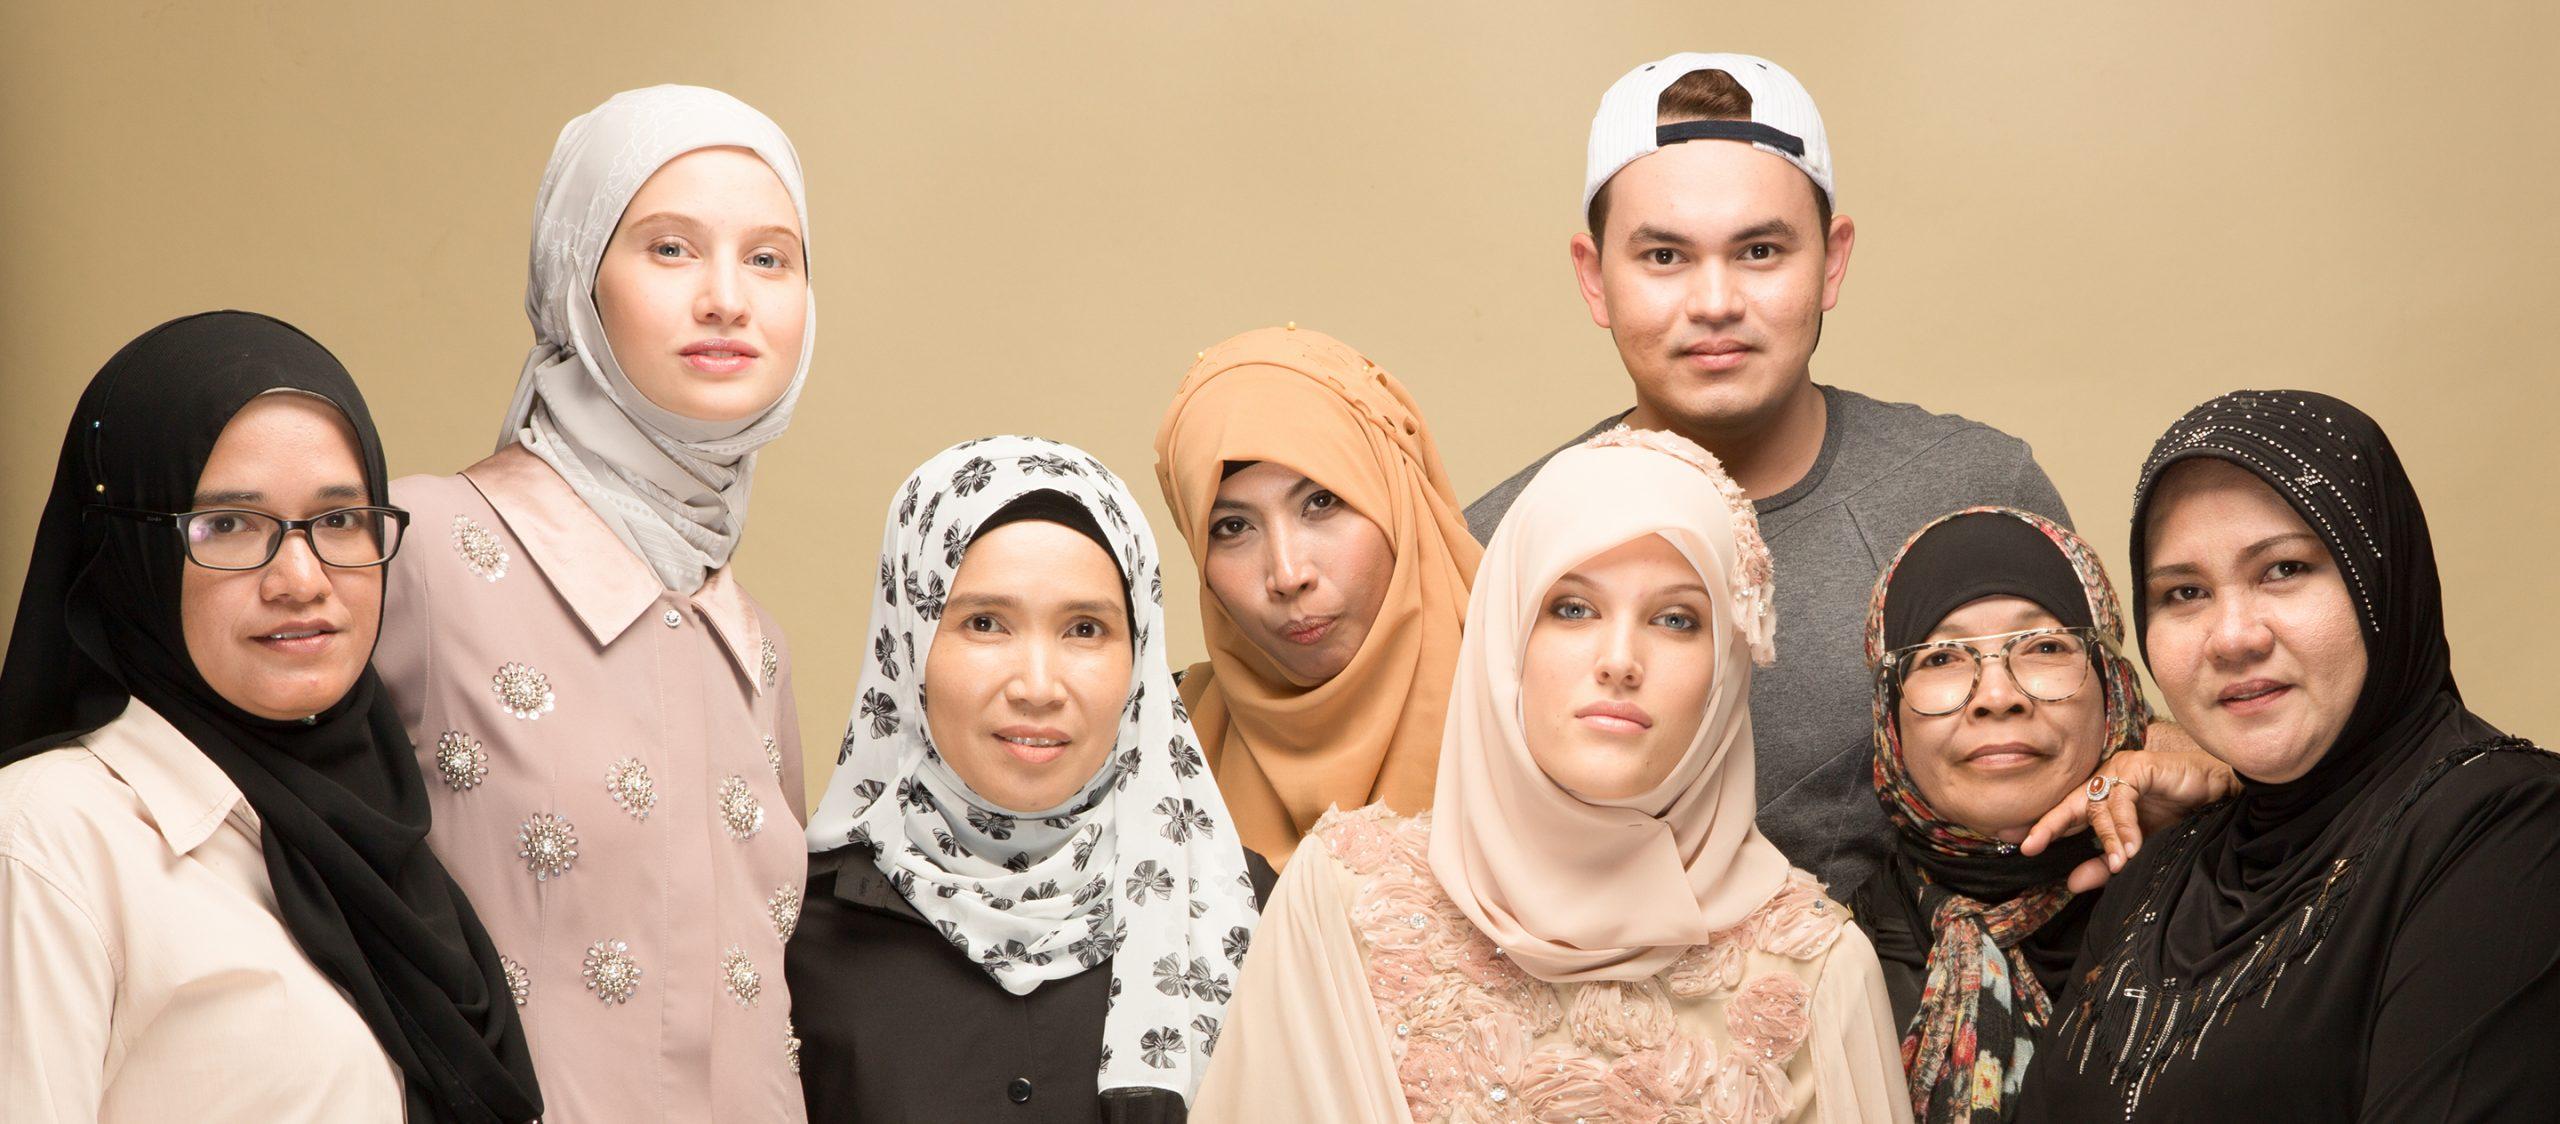 HEART CRAFT กลุ่มแฟชั่นมุสลิมที่เชื่อในความหลากหลายและเสรีภาพในการแสดงออก